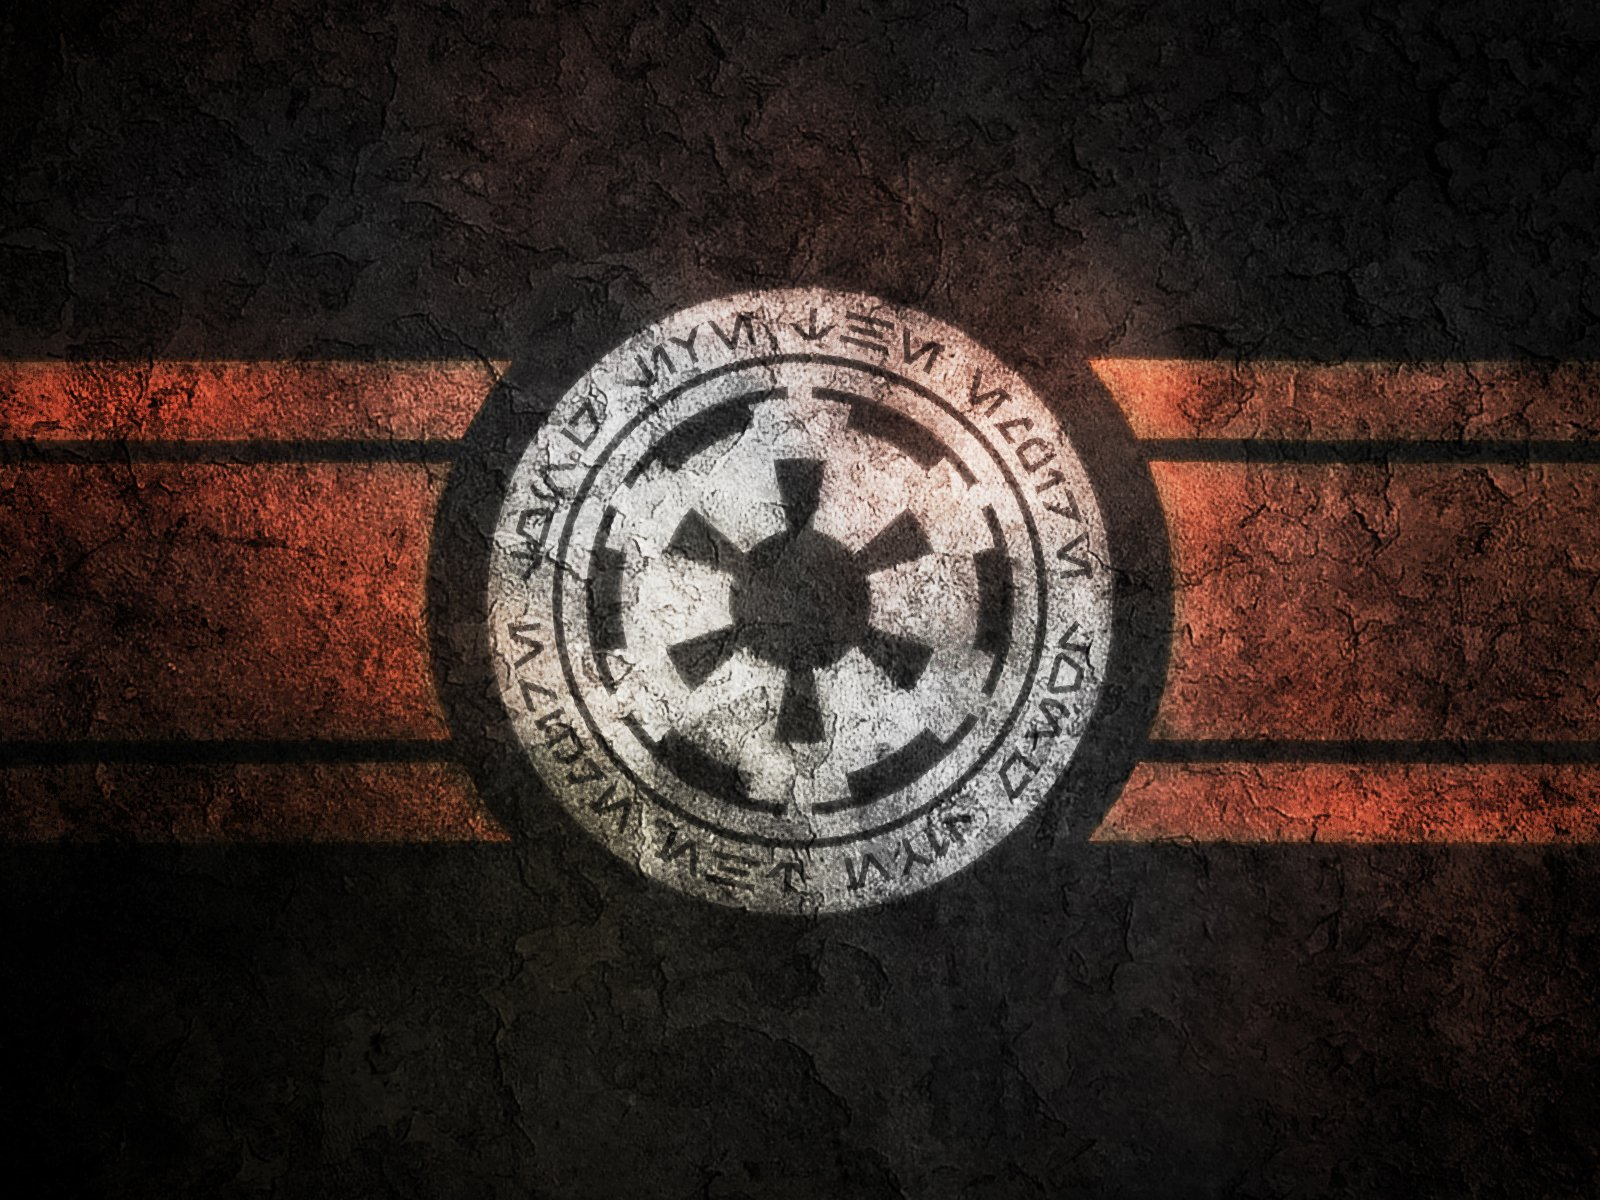 Star Wars Sith Galactic Empire Wallpaper